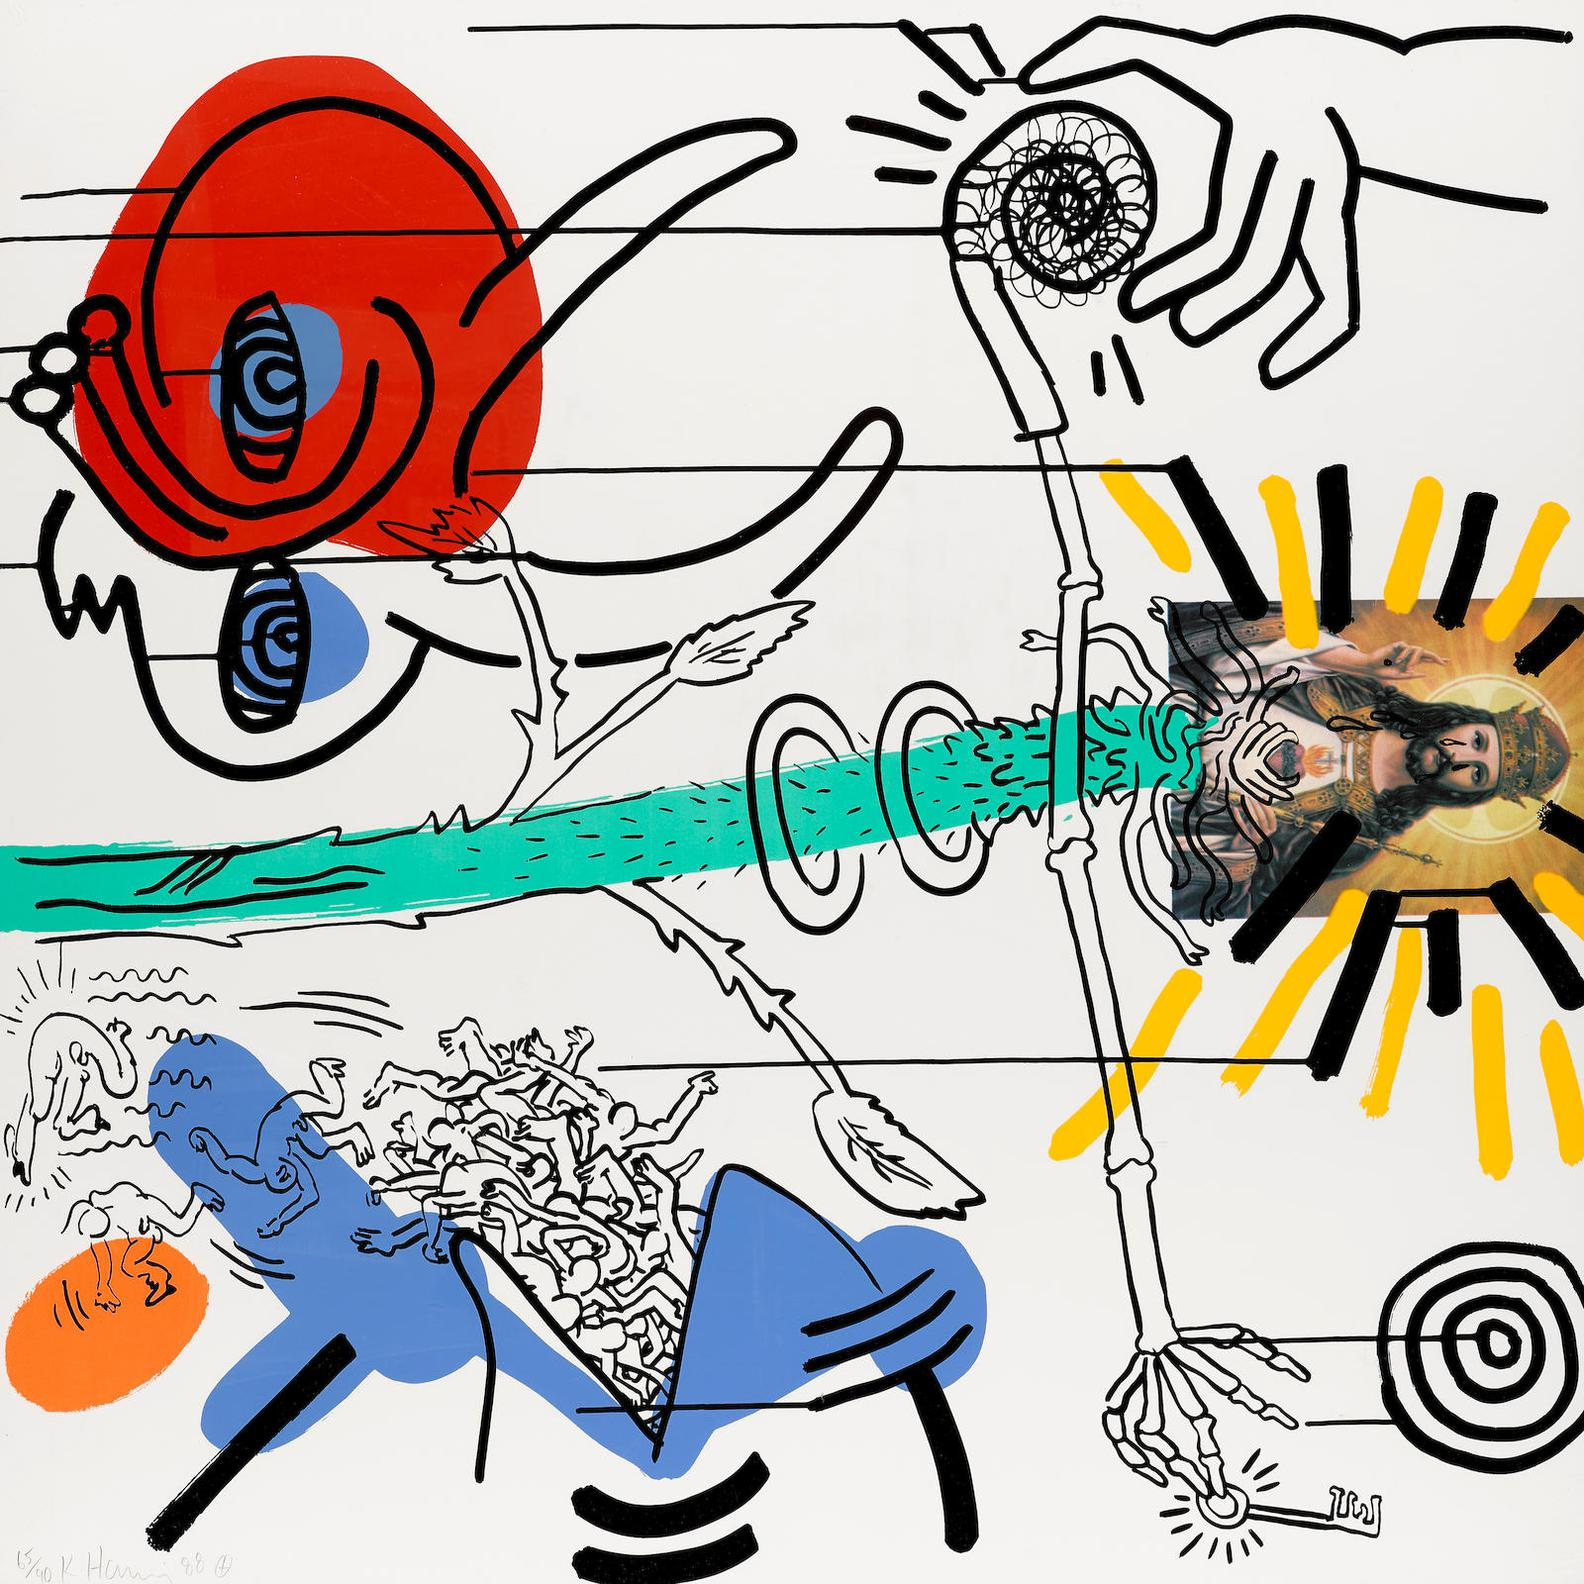 Keith Haring-Apocalypse #10 (Litterman P.108)-1988